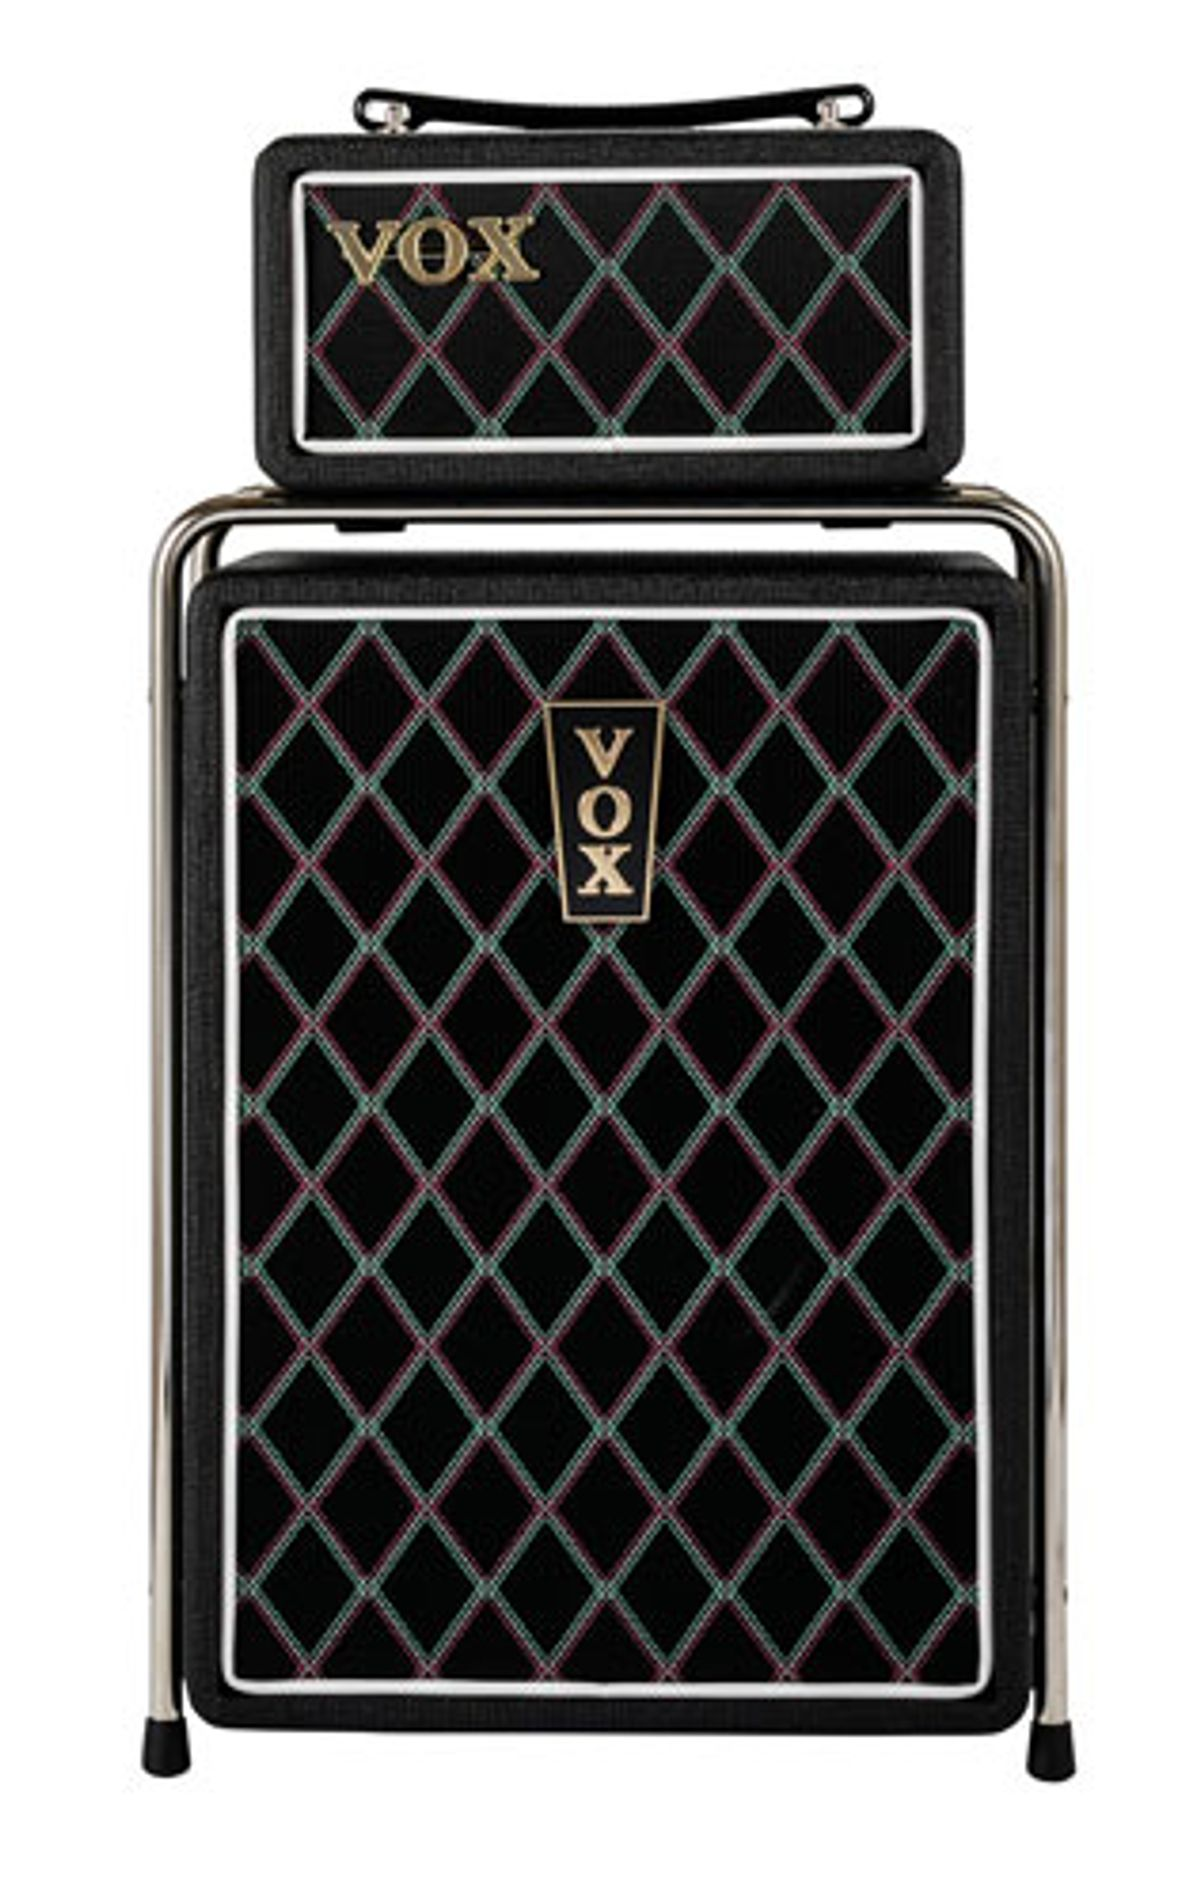 Vox Introduces the Mini Superbeetle Bass